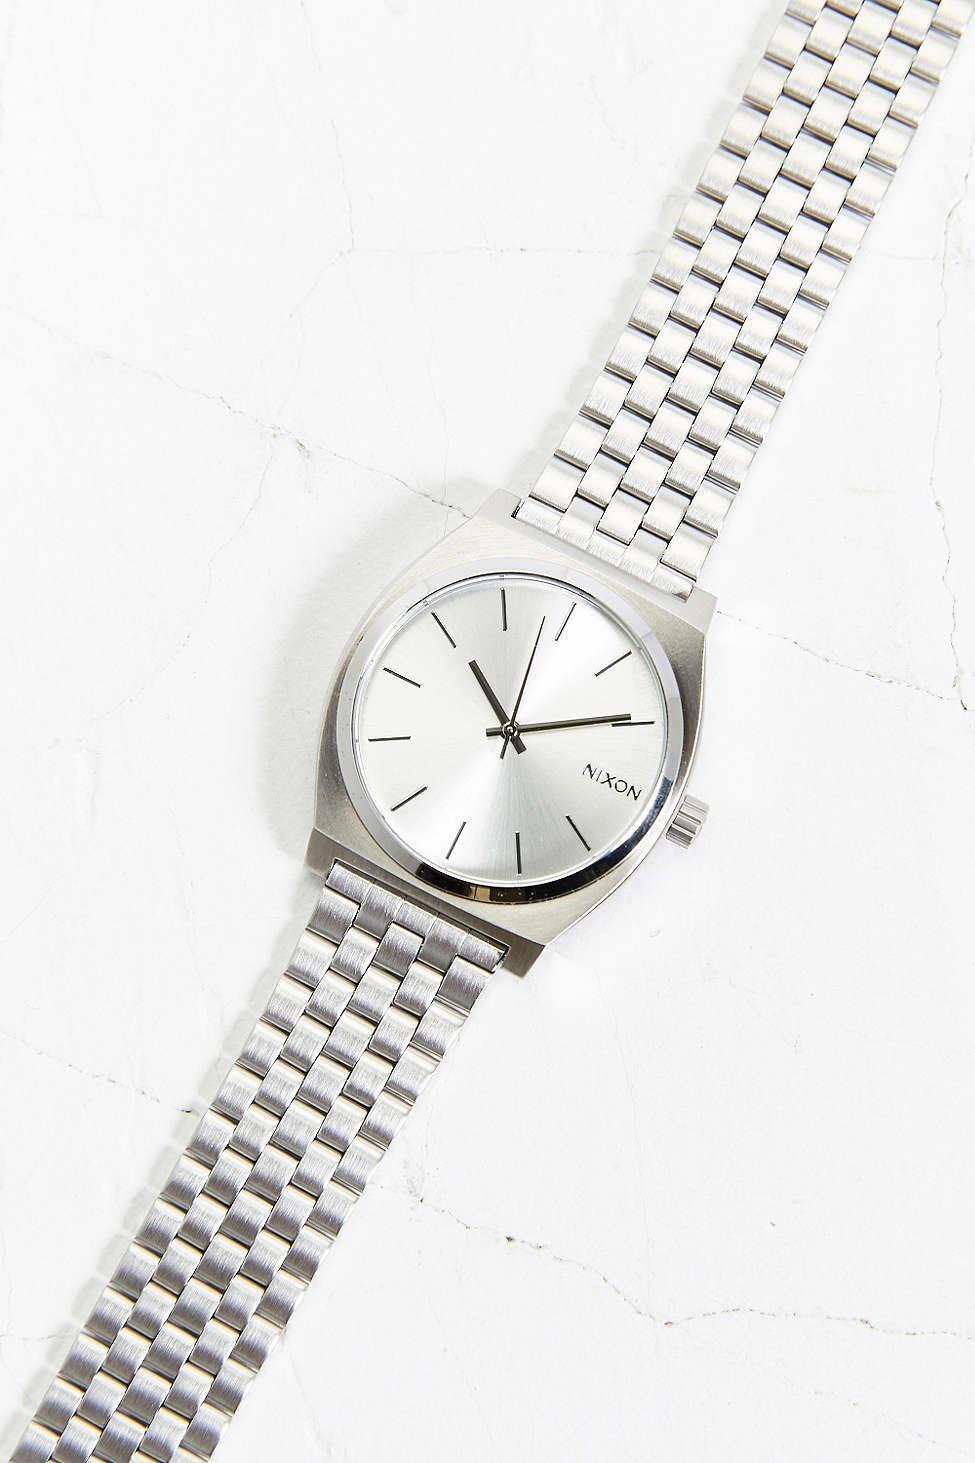 Nixon Metal Time Teller Watch $100